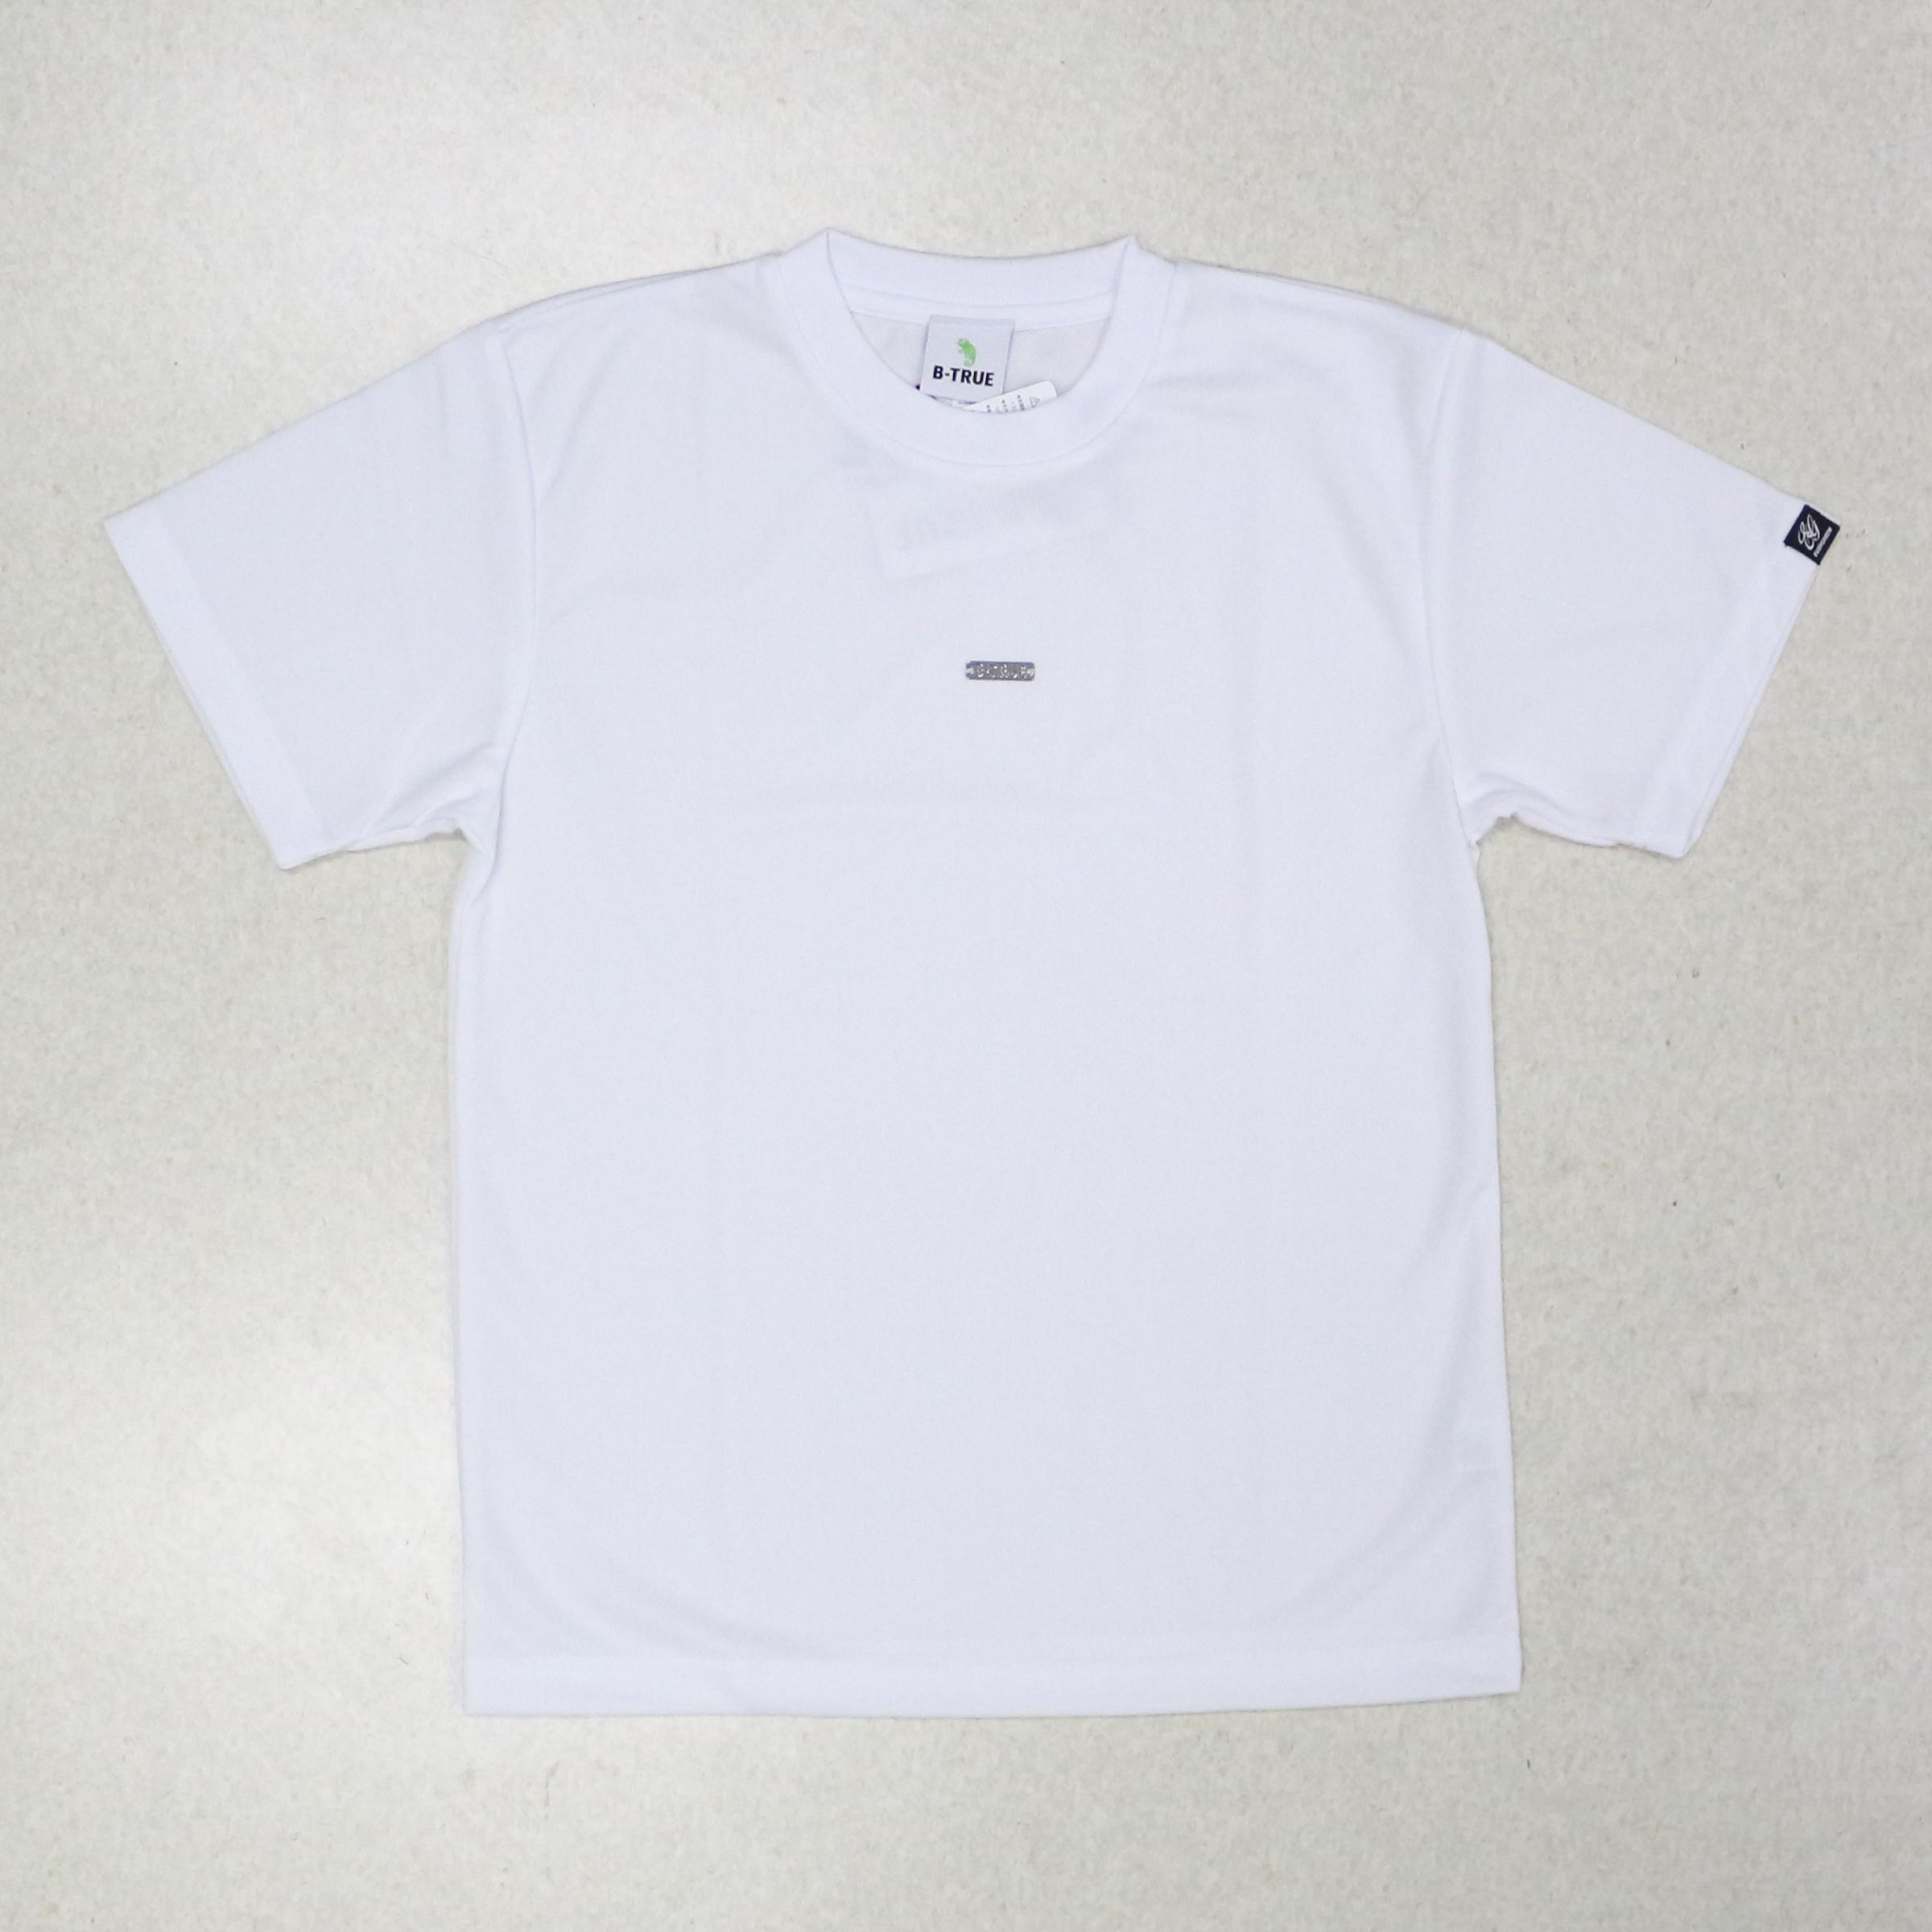 Sale Evergreen T-Shirt Dry Fit Short Sleeve B-True B Size S White(6413)